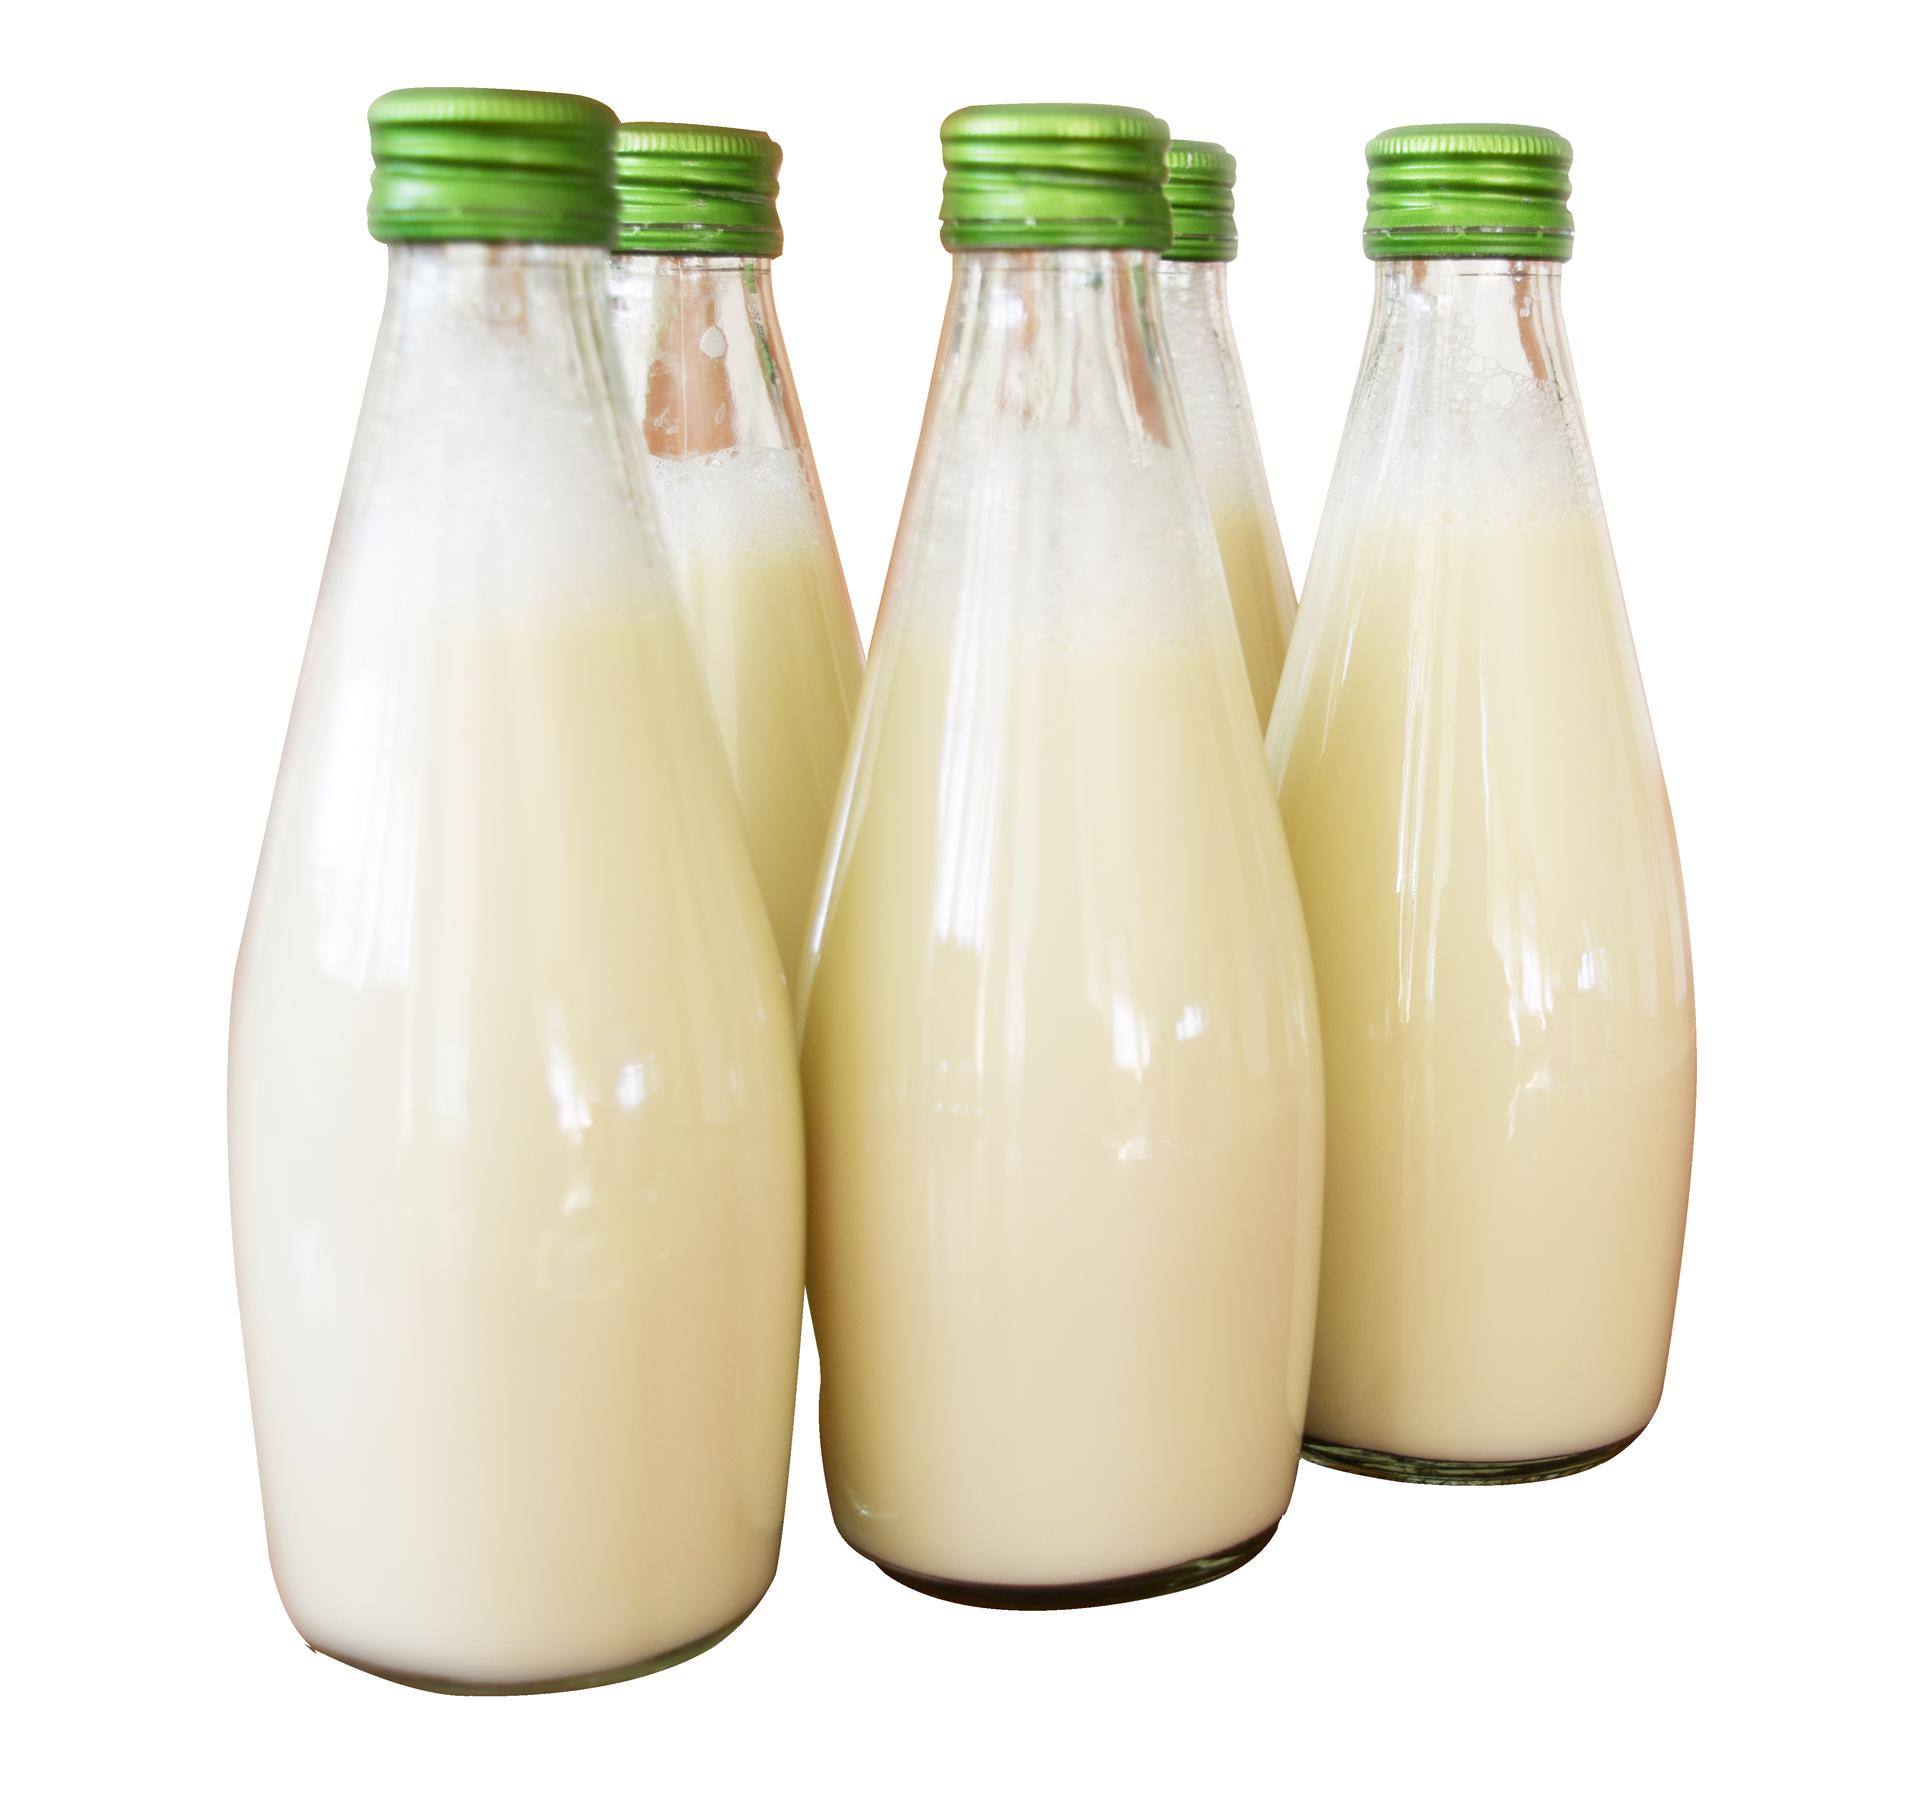 PNG Milk Bottle - 78760